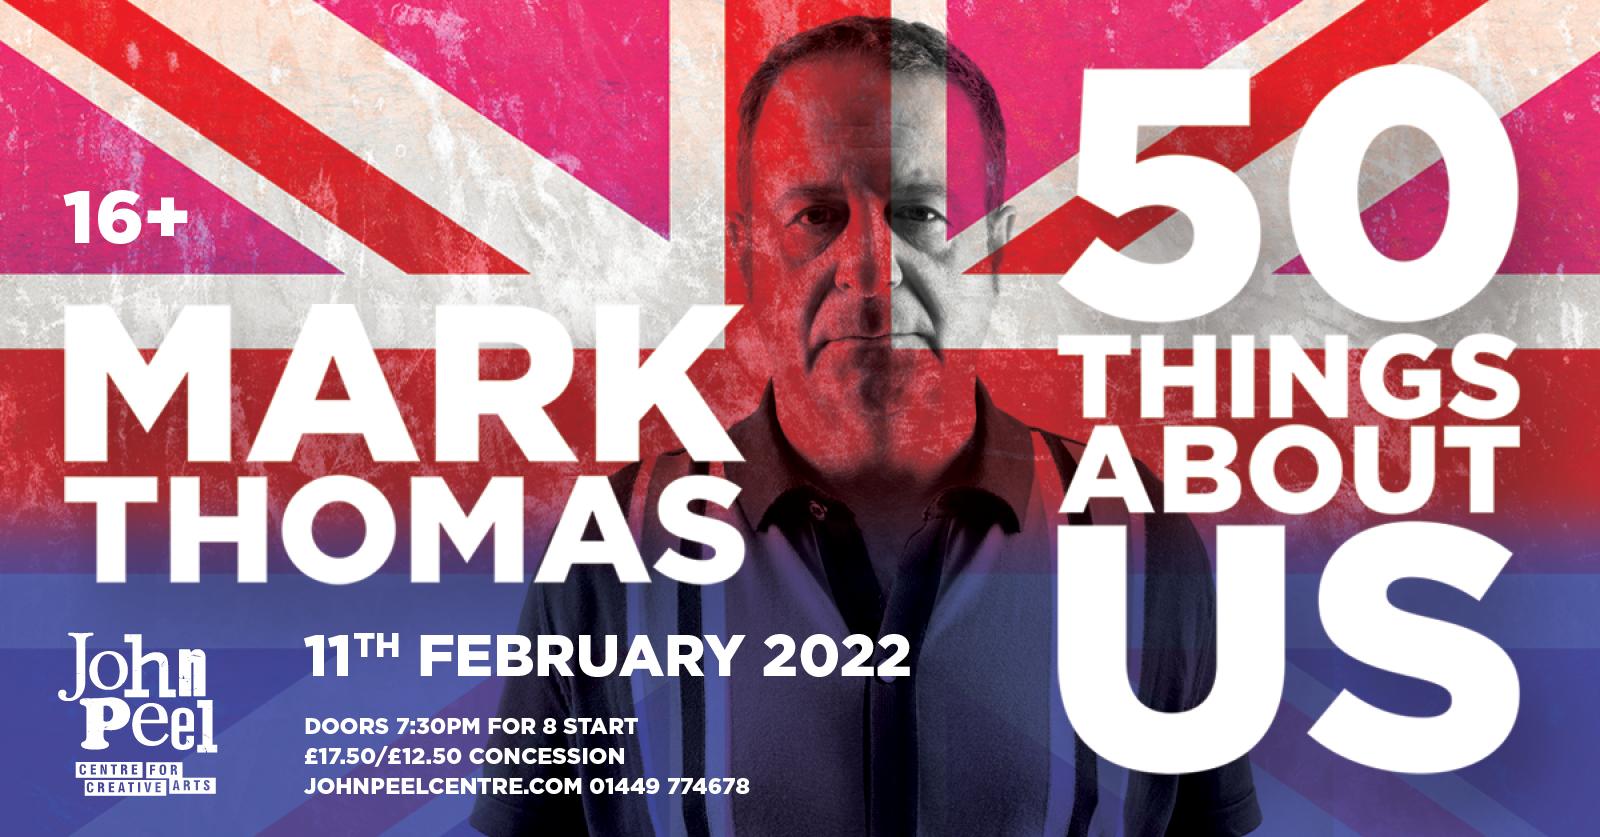 Mark Thomas: 50 Things About Us @ John Peel Centre